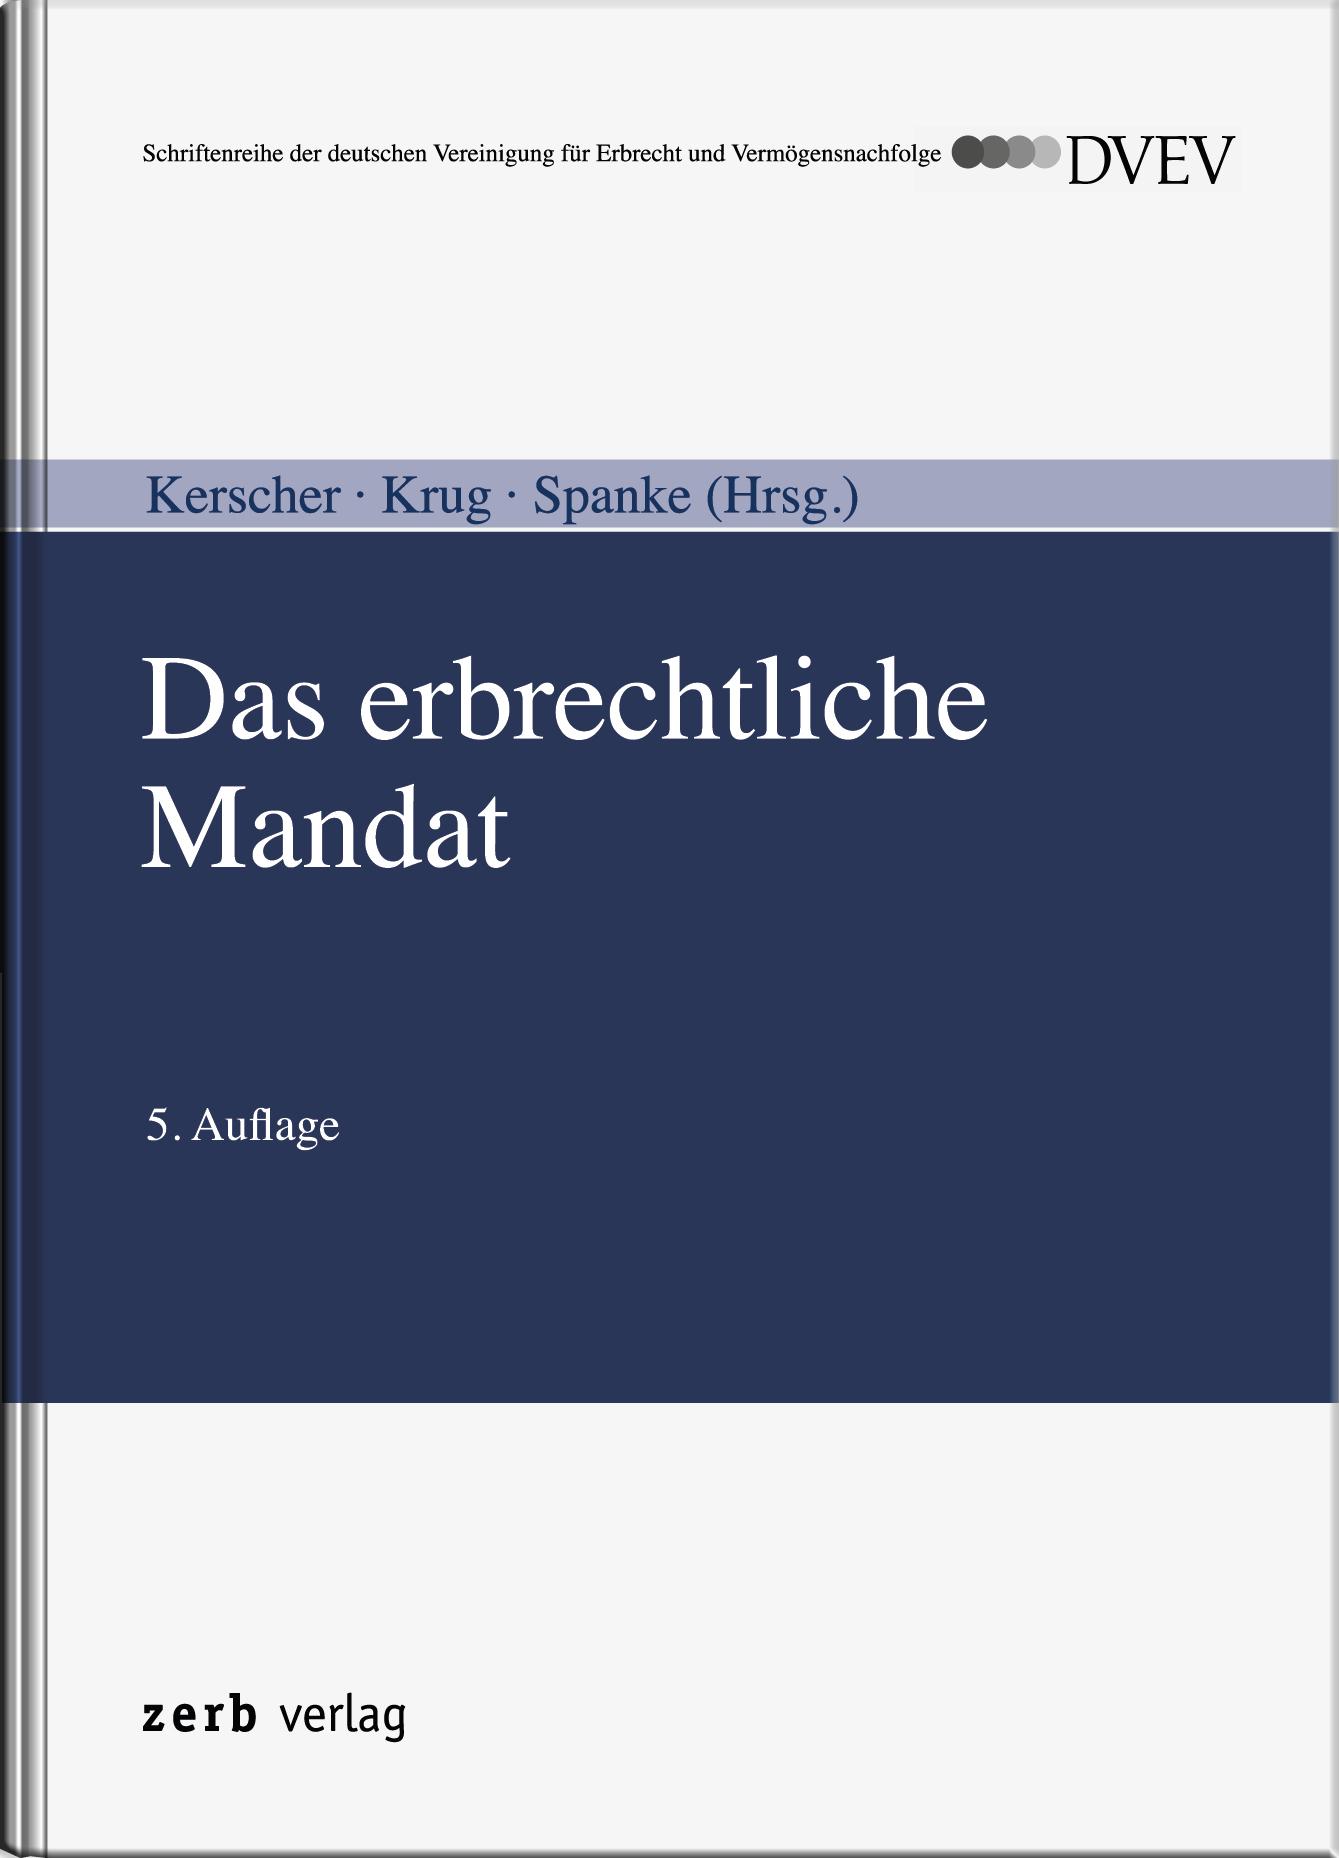 Das erbrechtliche Mandat Karl-Ludwig Kerscher